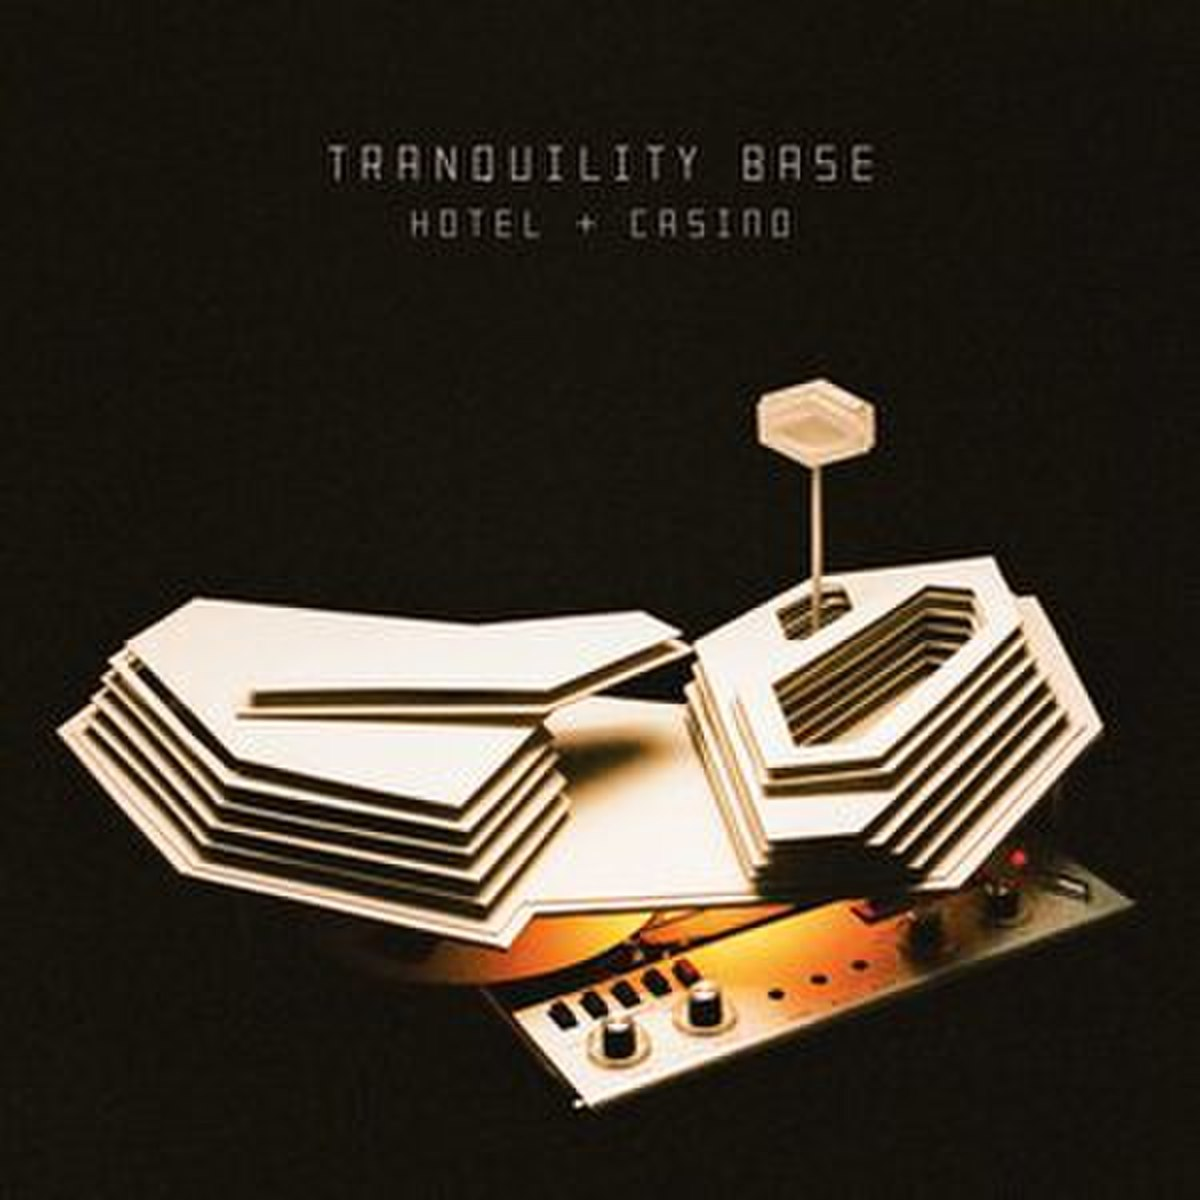 tranquility base hotel & casino metacritic